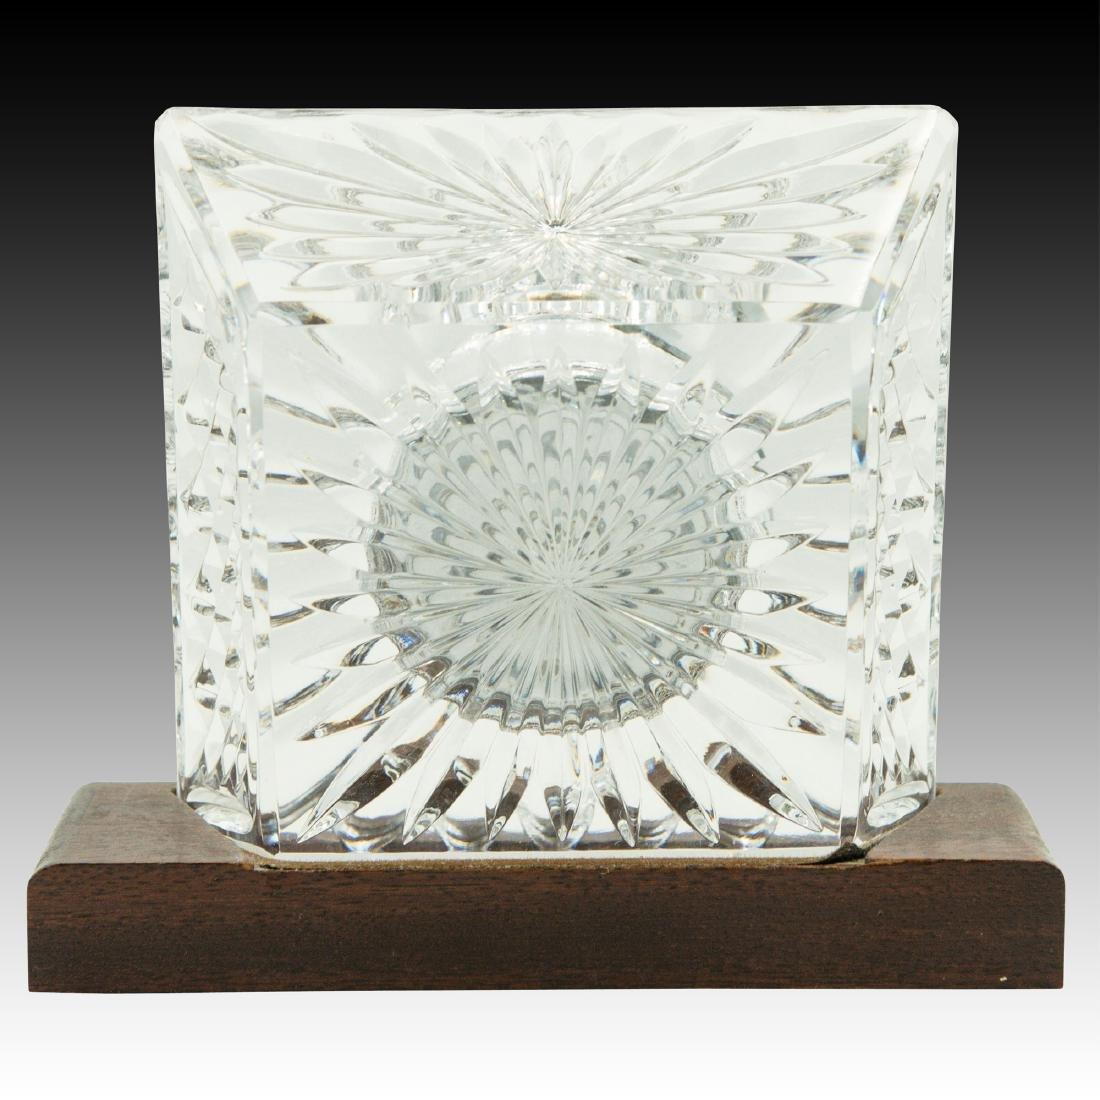 8PC WATERFORD LISMORE GLASSES, CLOCK, PEN HOLDER - 3